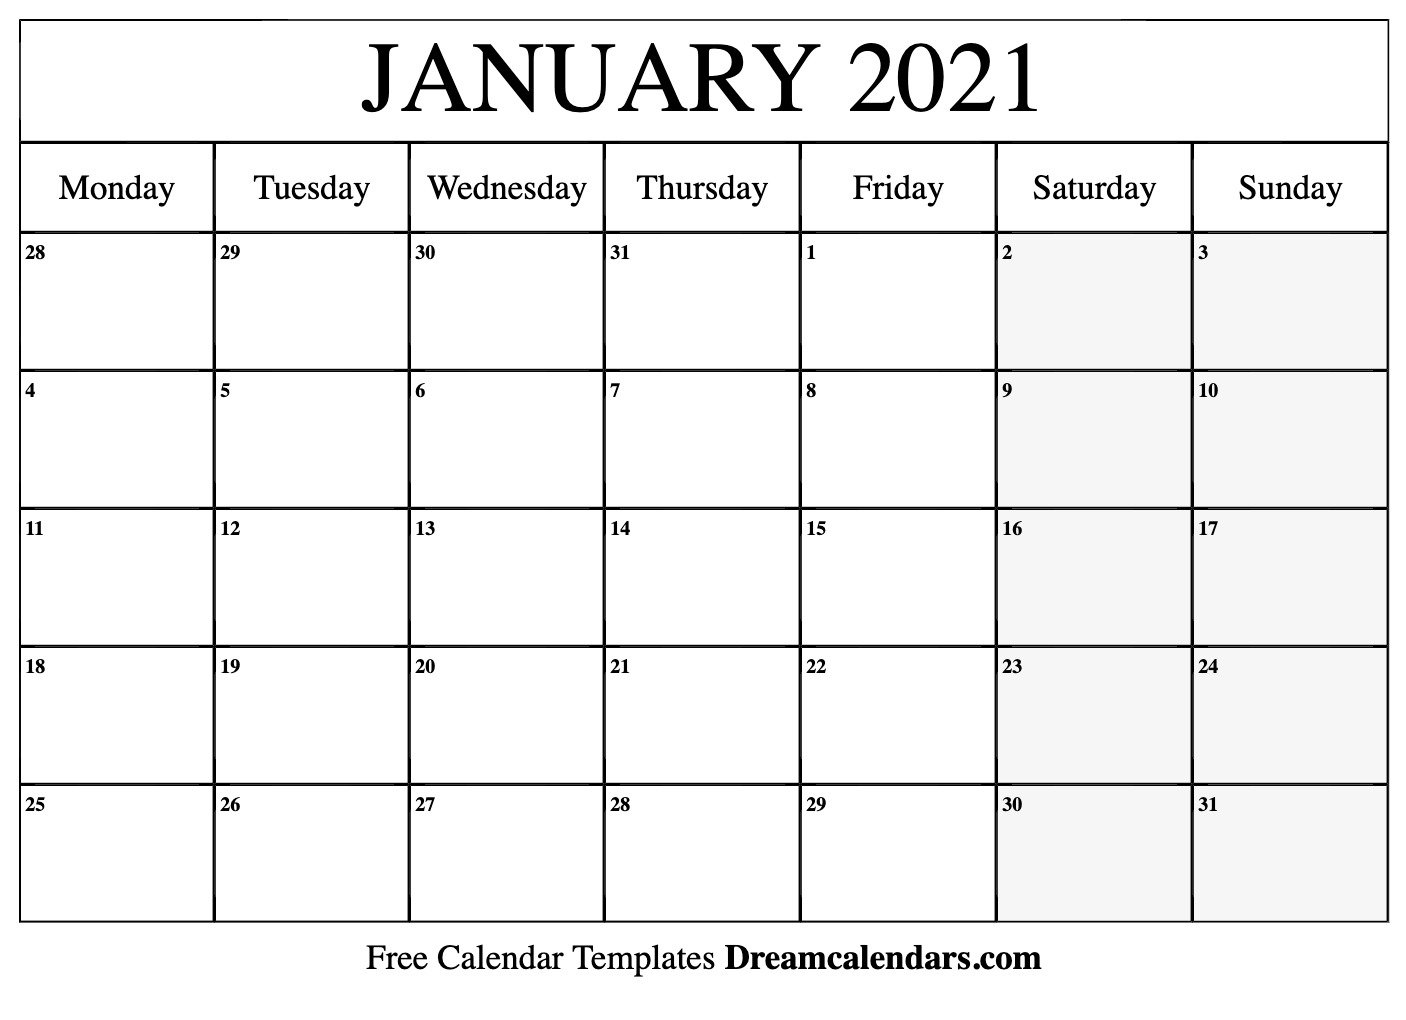 January 2021 Calendar | Free Blank Printable Templates With Regard To Printable Sunrise Sunset Calendar 2021